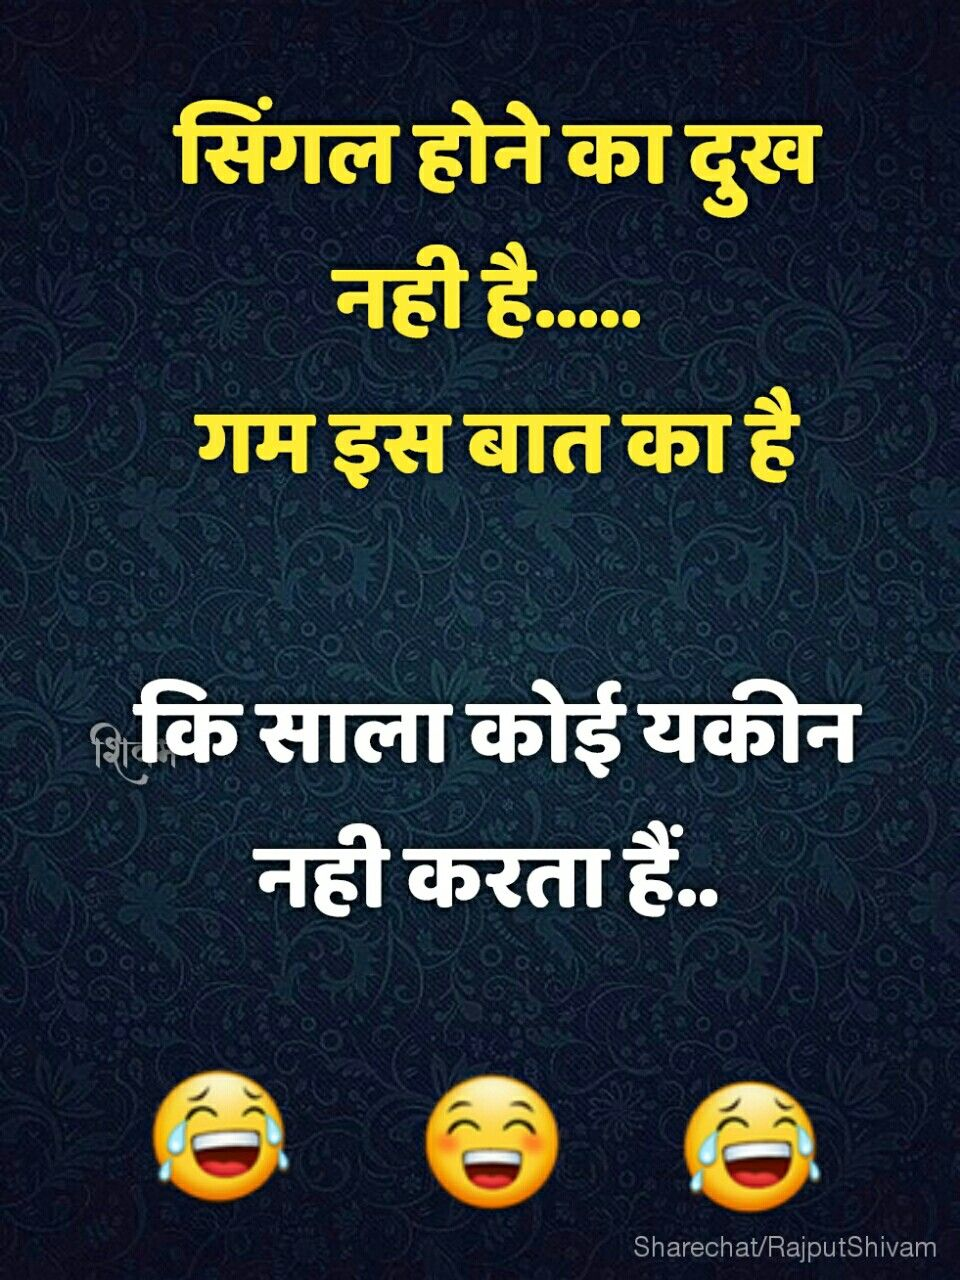 Joke In Hindi Funny Whatsapp Status Single Quotes Funny Funny Joke Quote